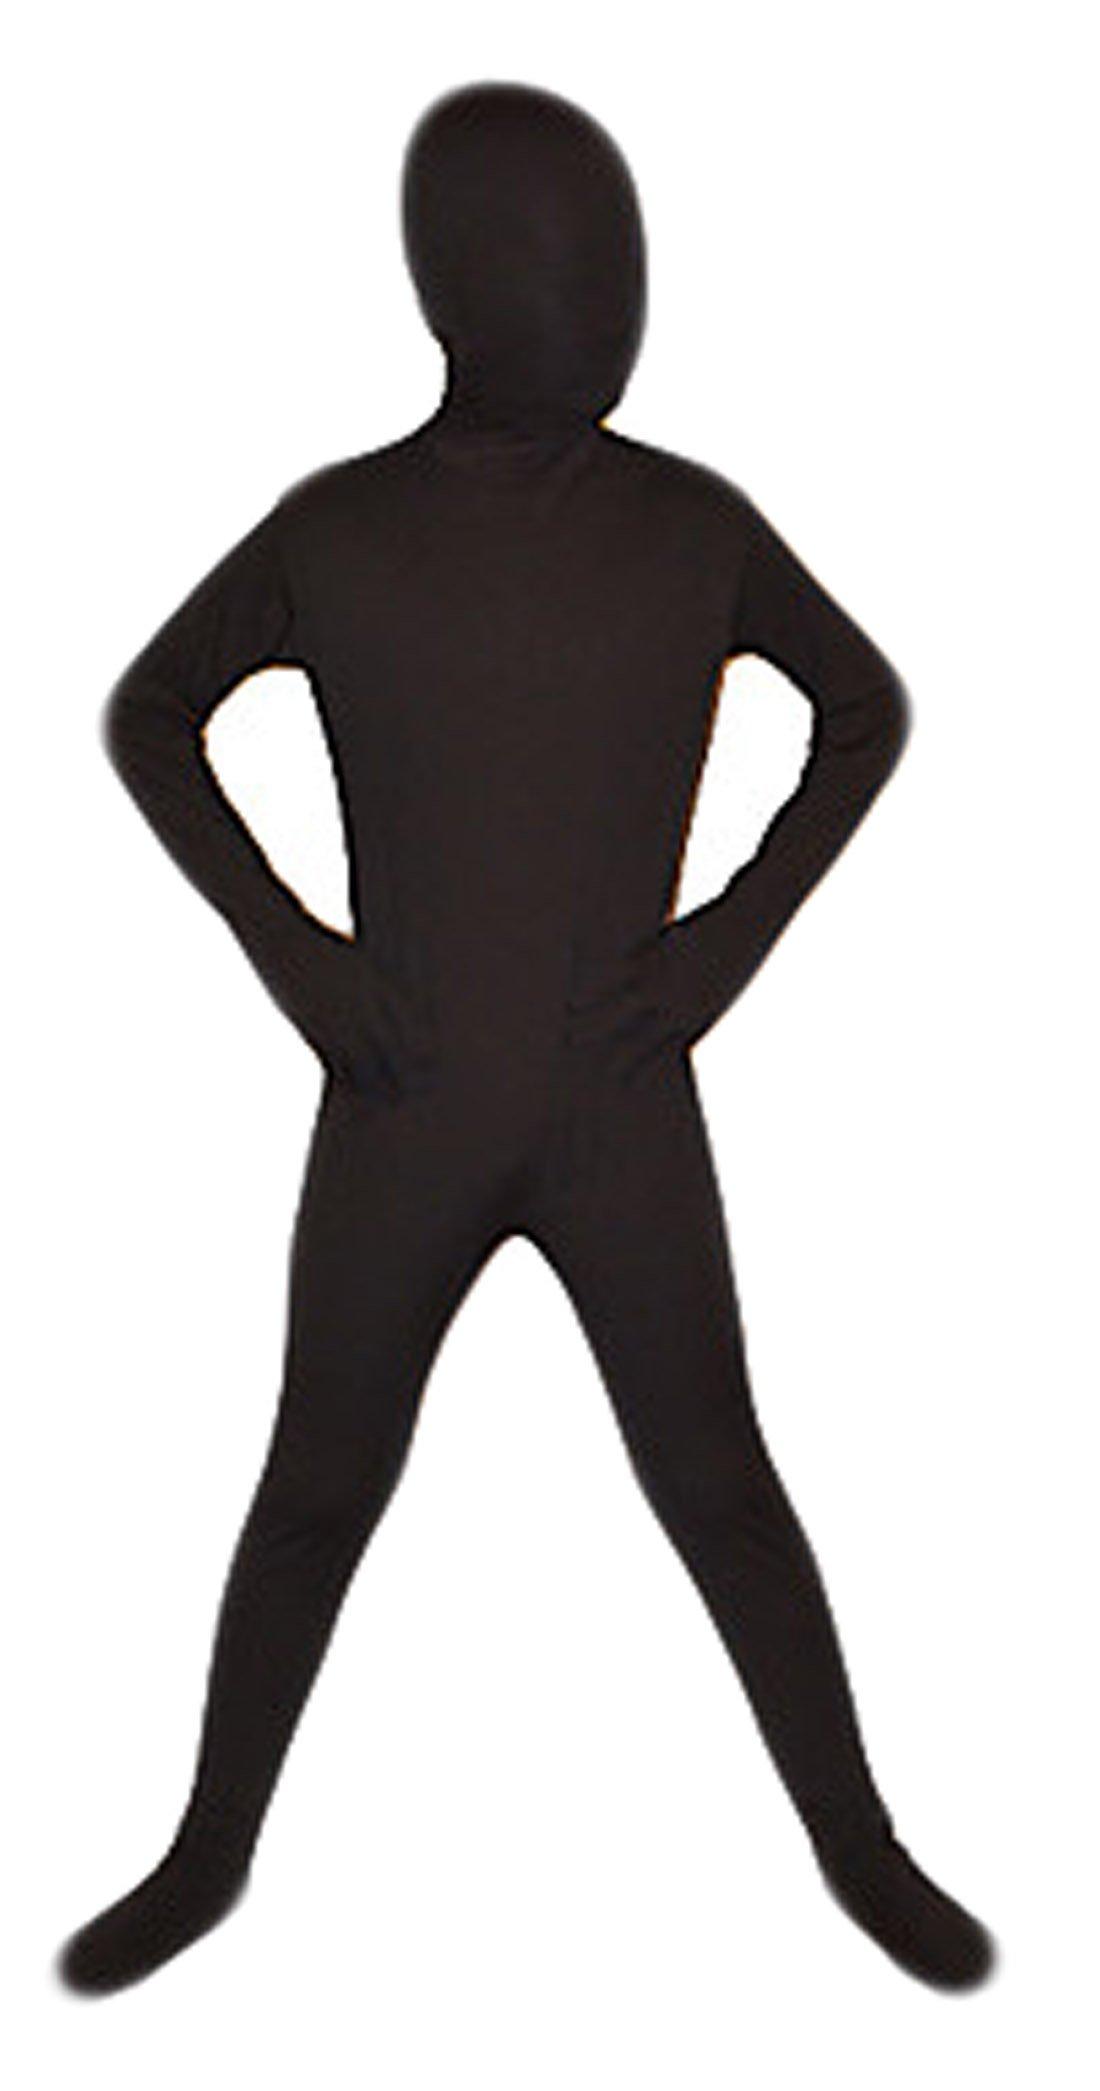 Seeksmile Kids Costume Full Body Lycra Zentai Suit (Large, Black)